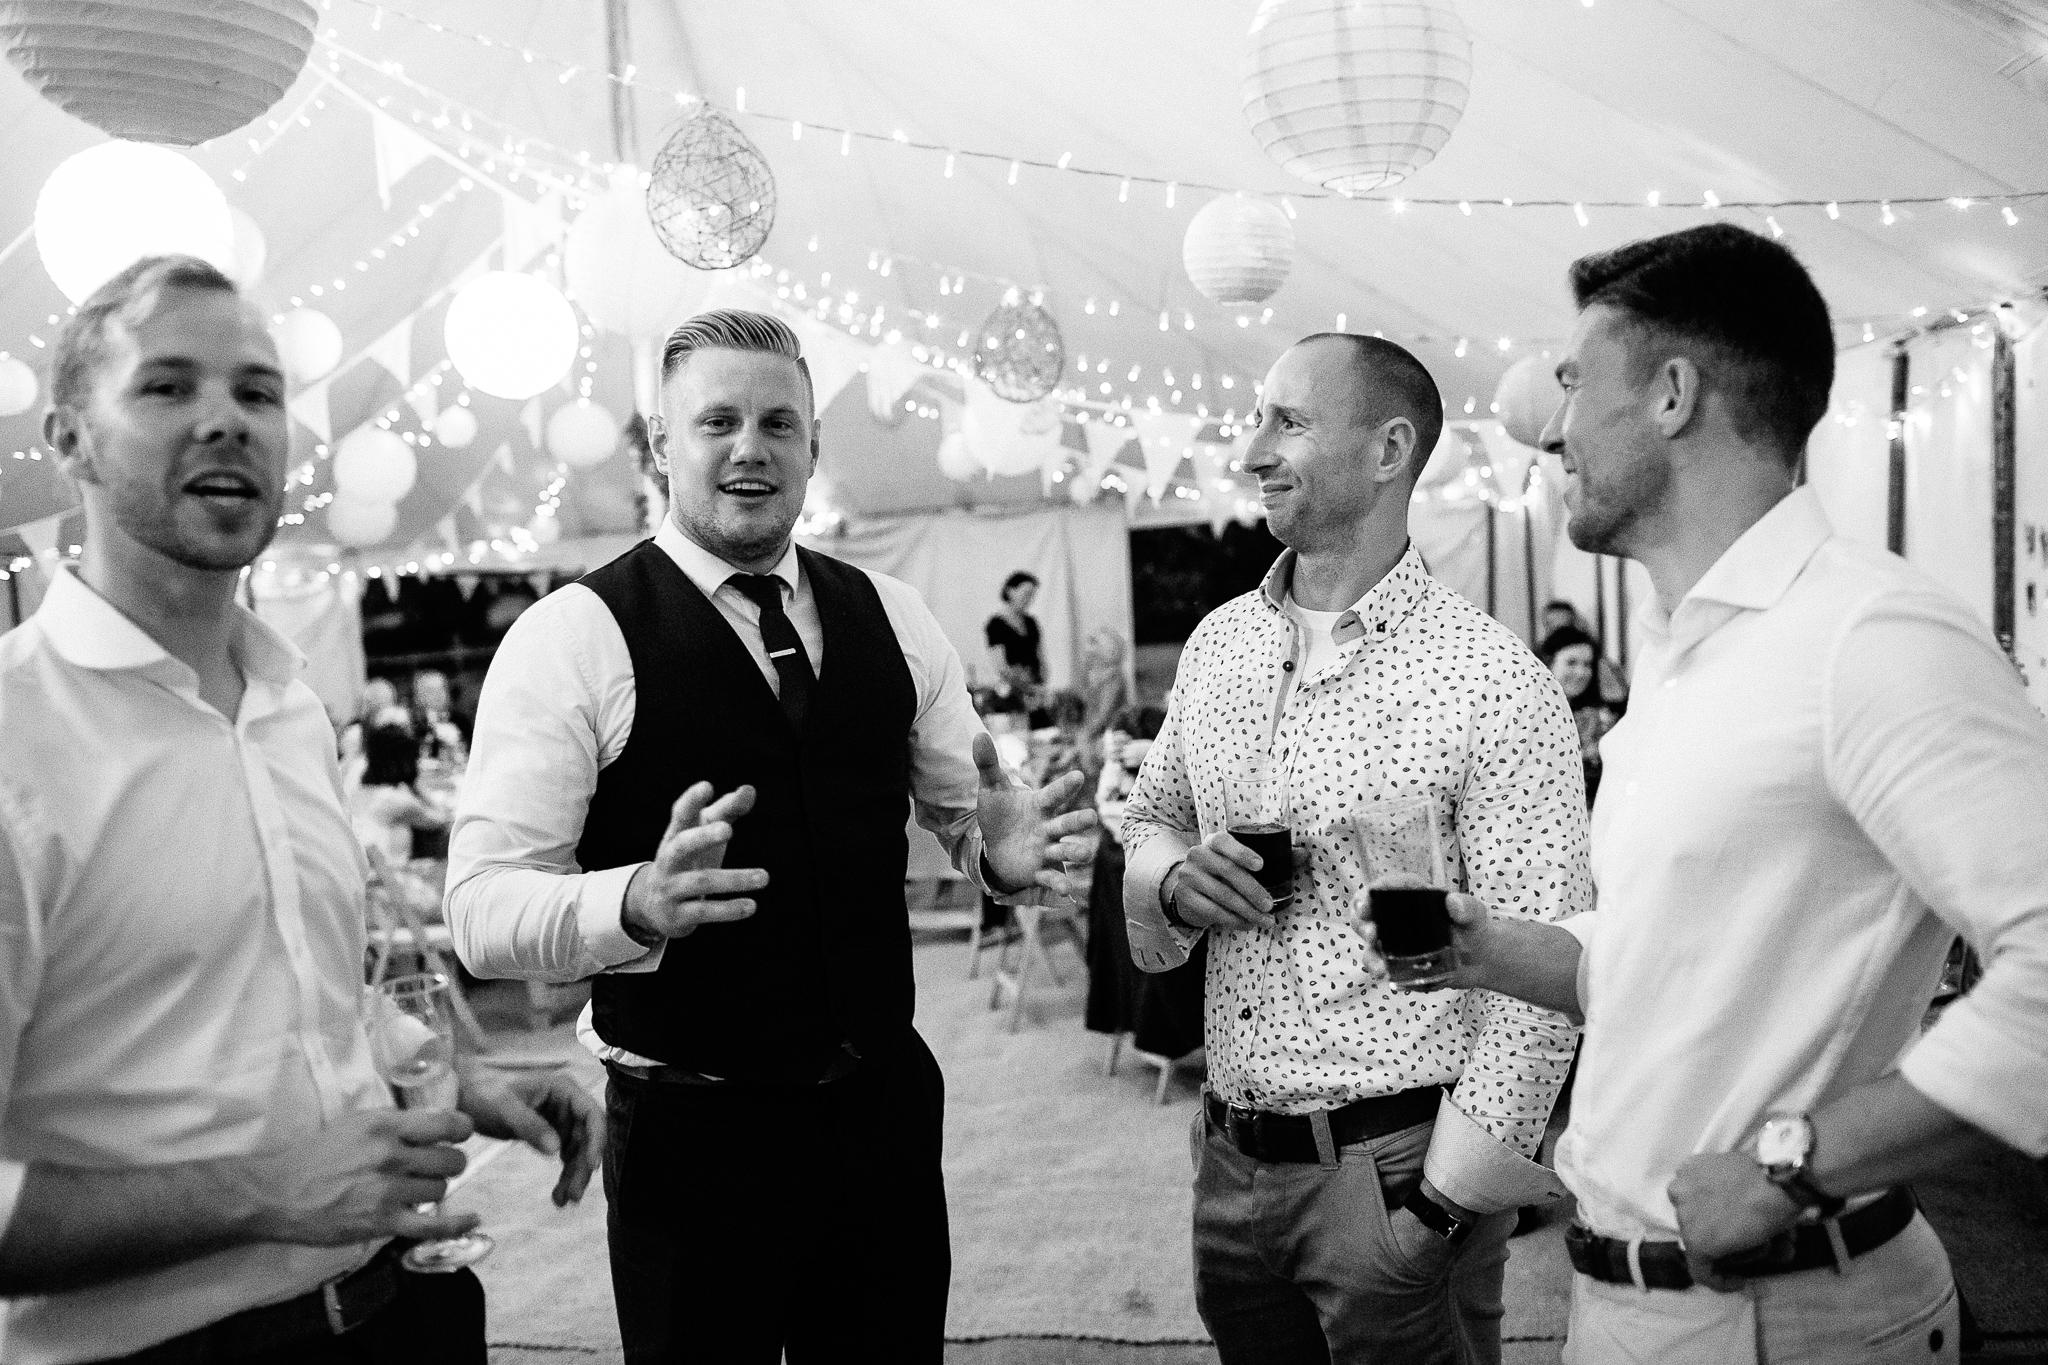 grantham_wedding_photographer-113.jpg